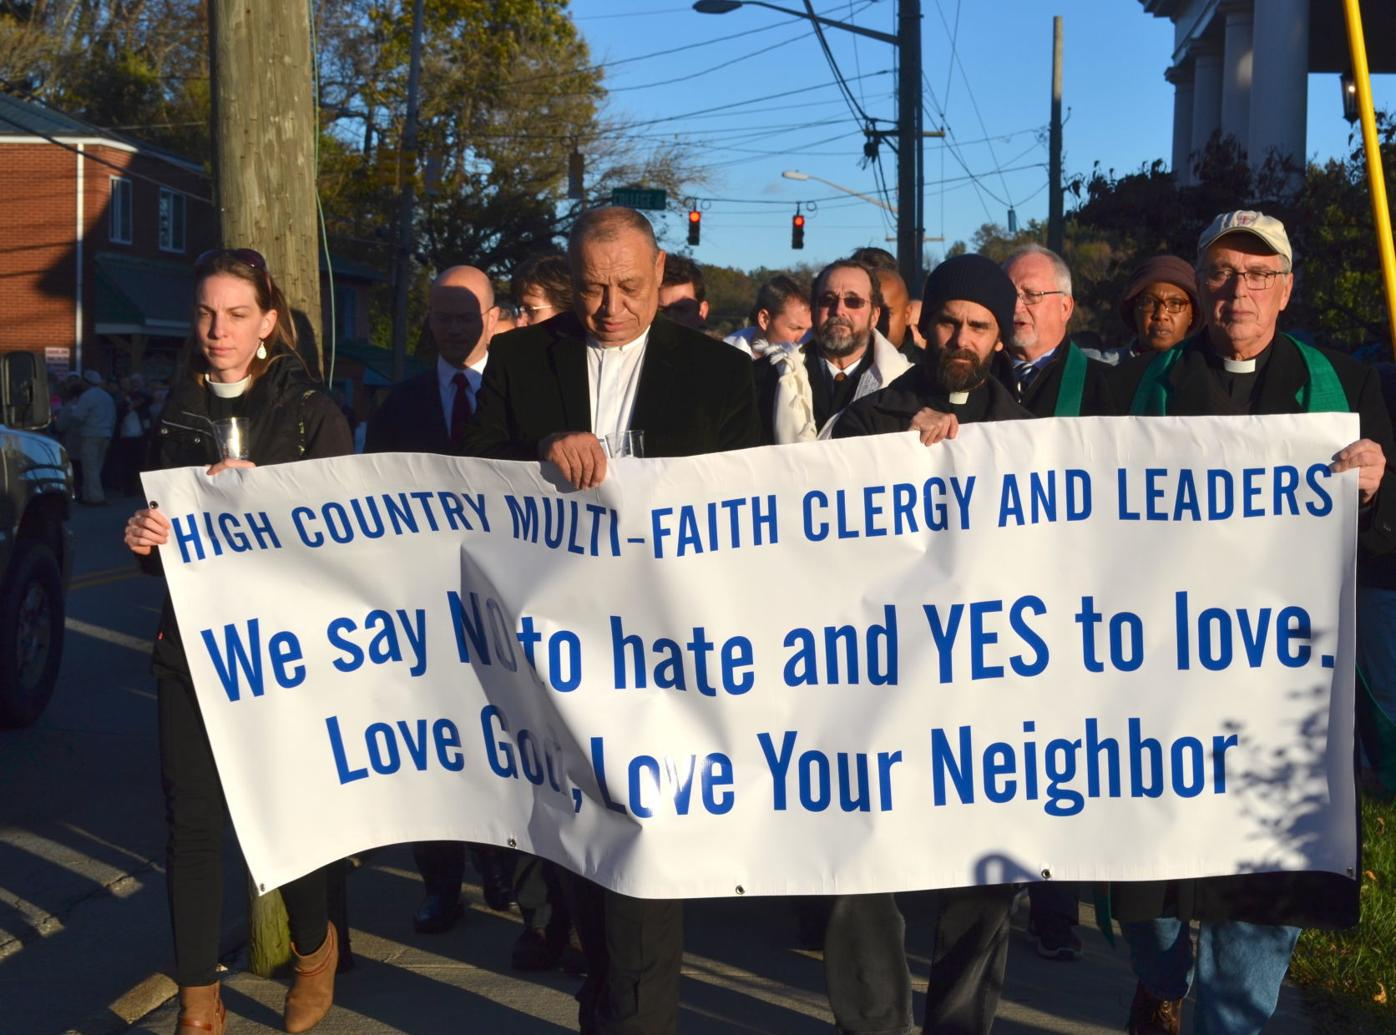 High Country Multi-Faith Clergy and Leaders